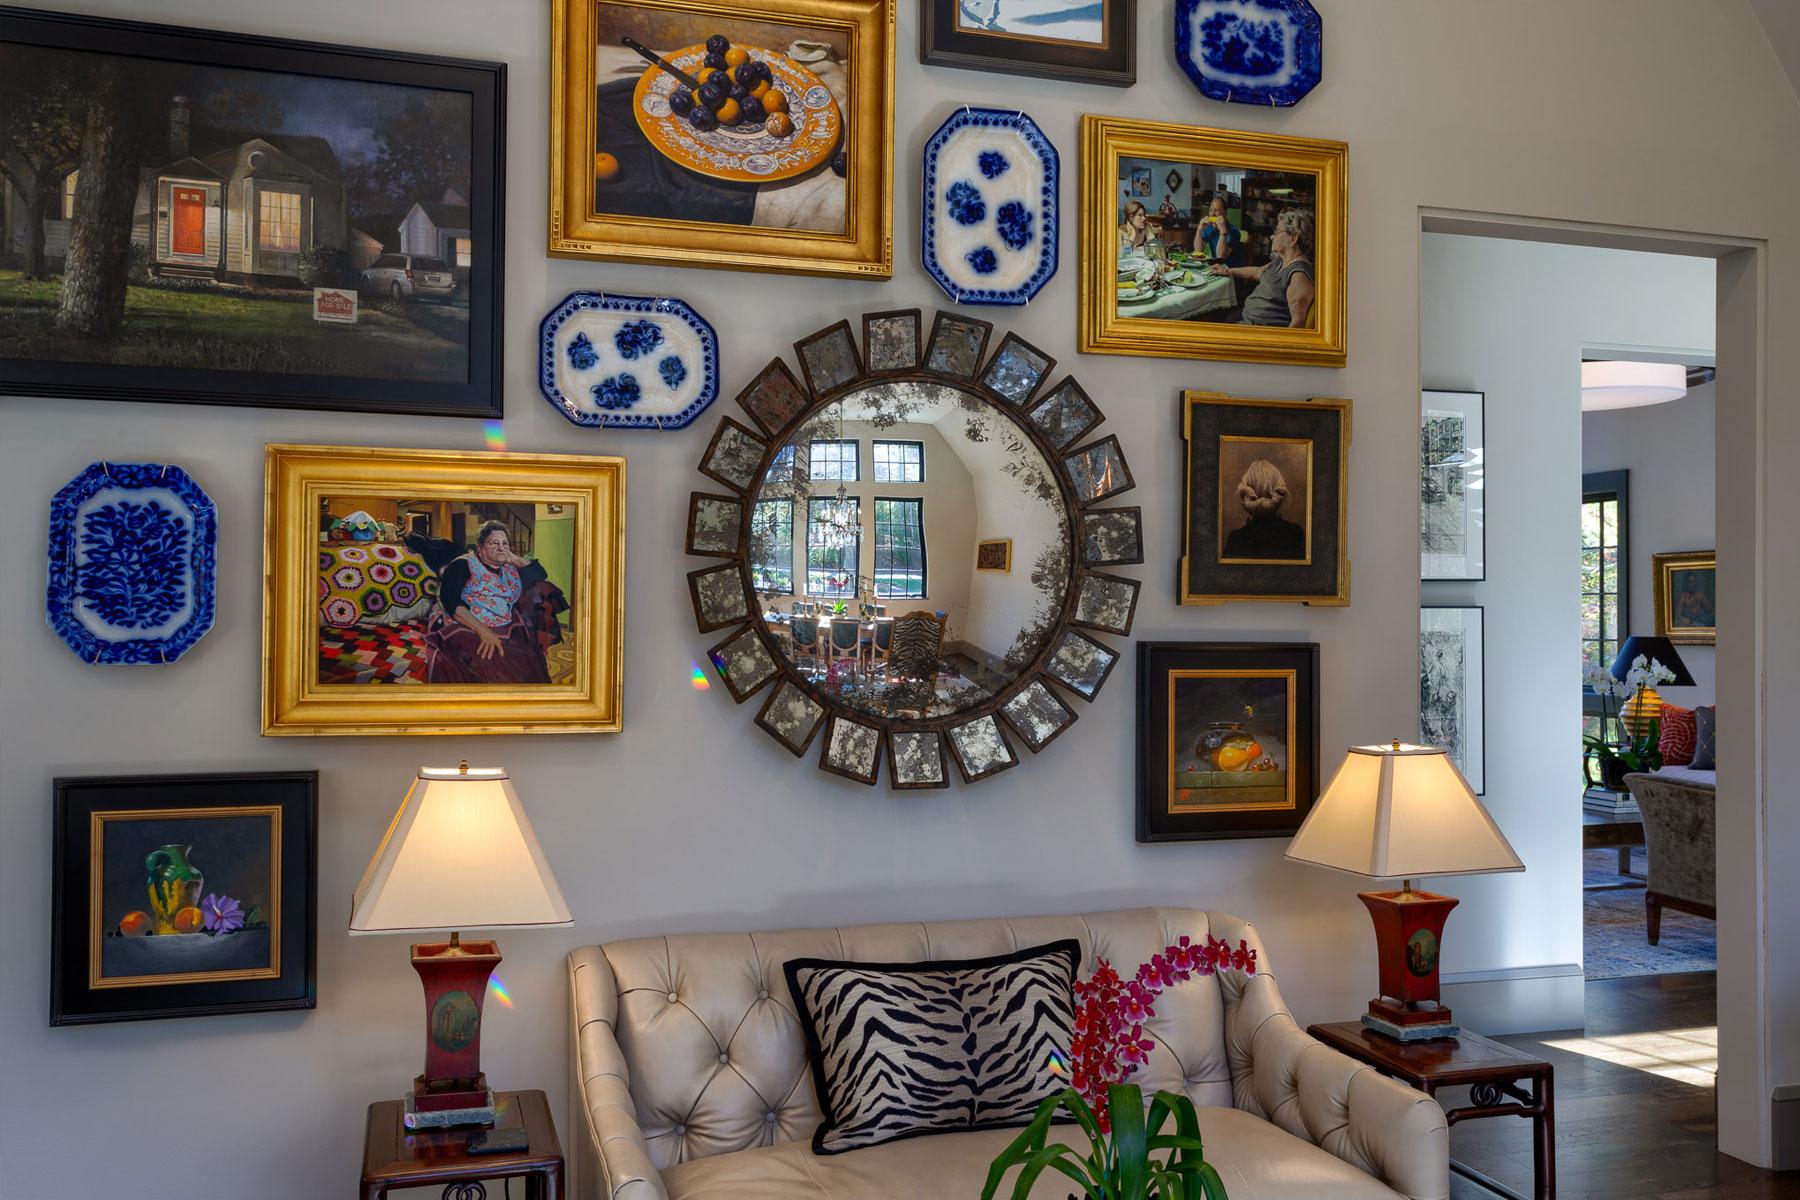 Gallery wall of original art